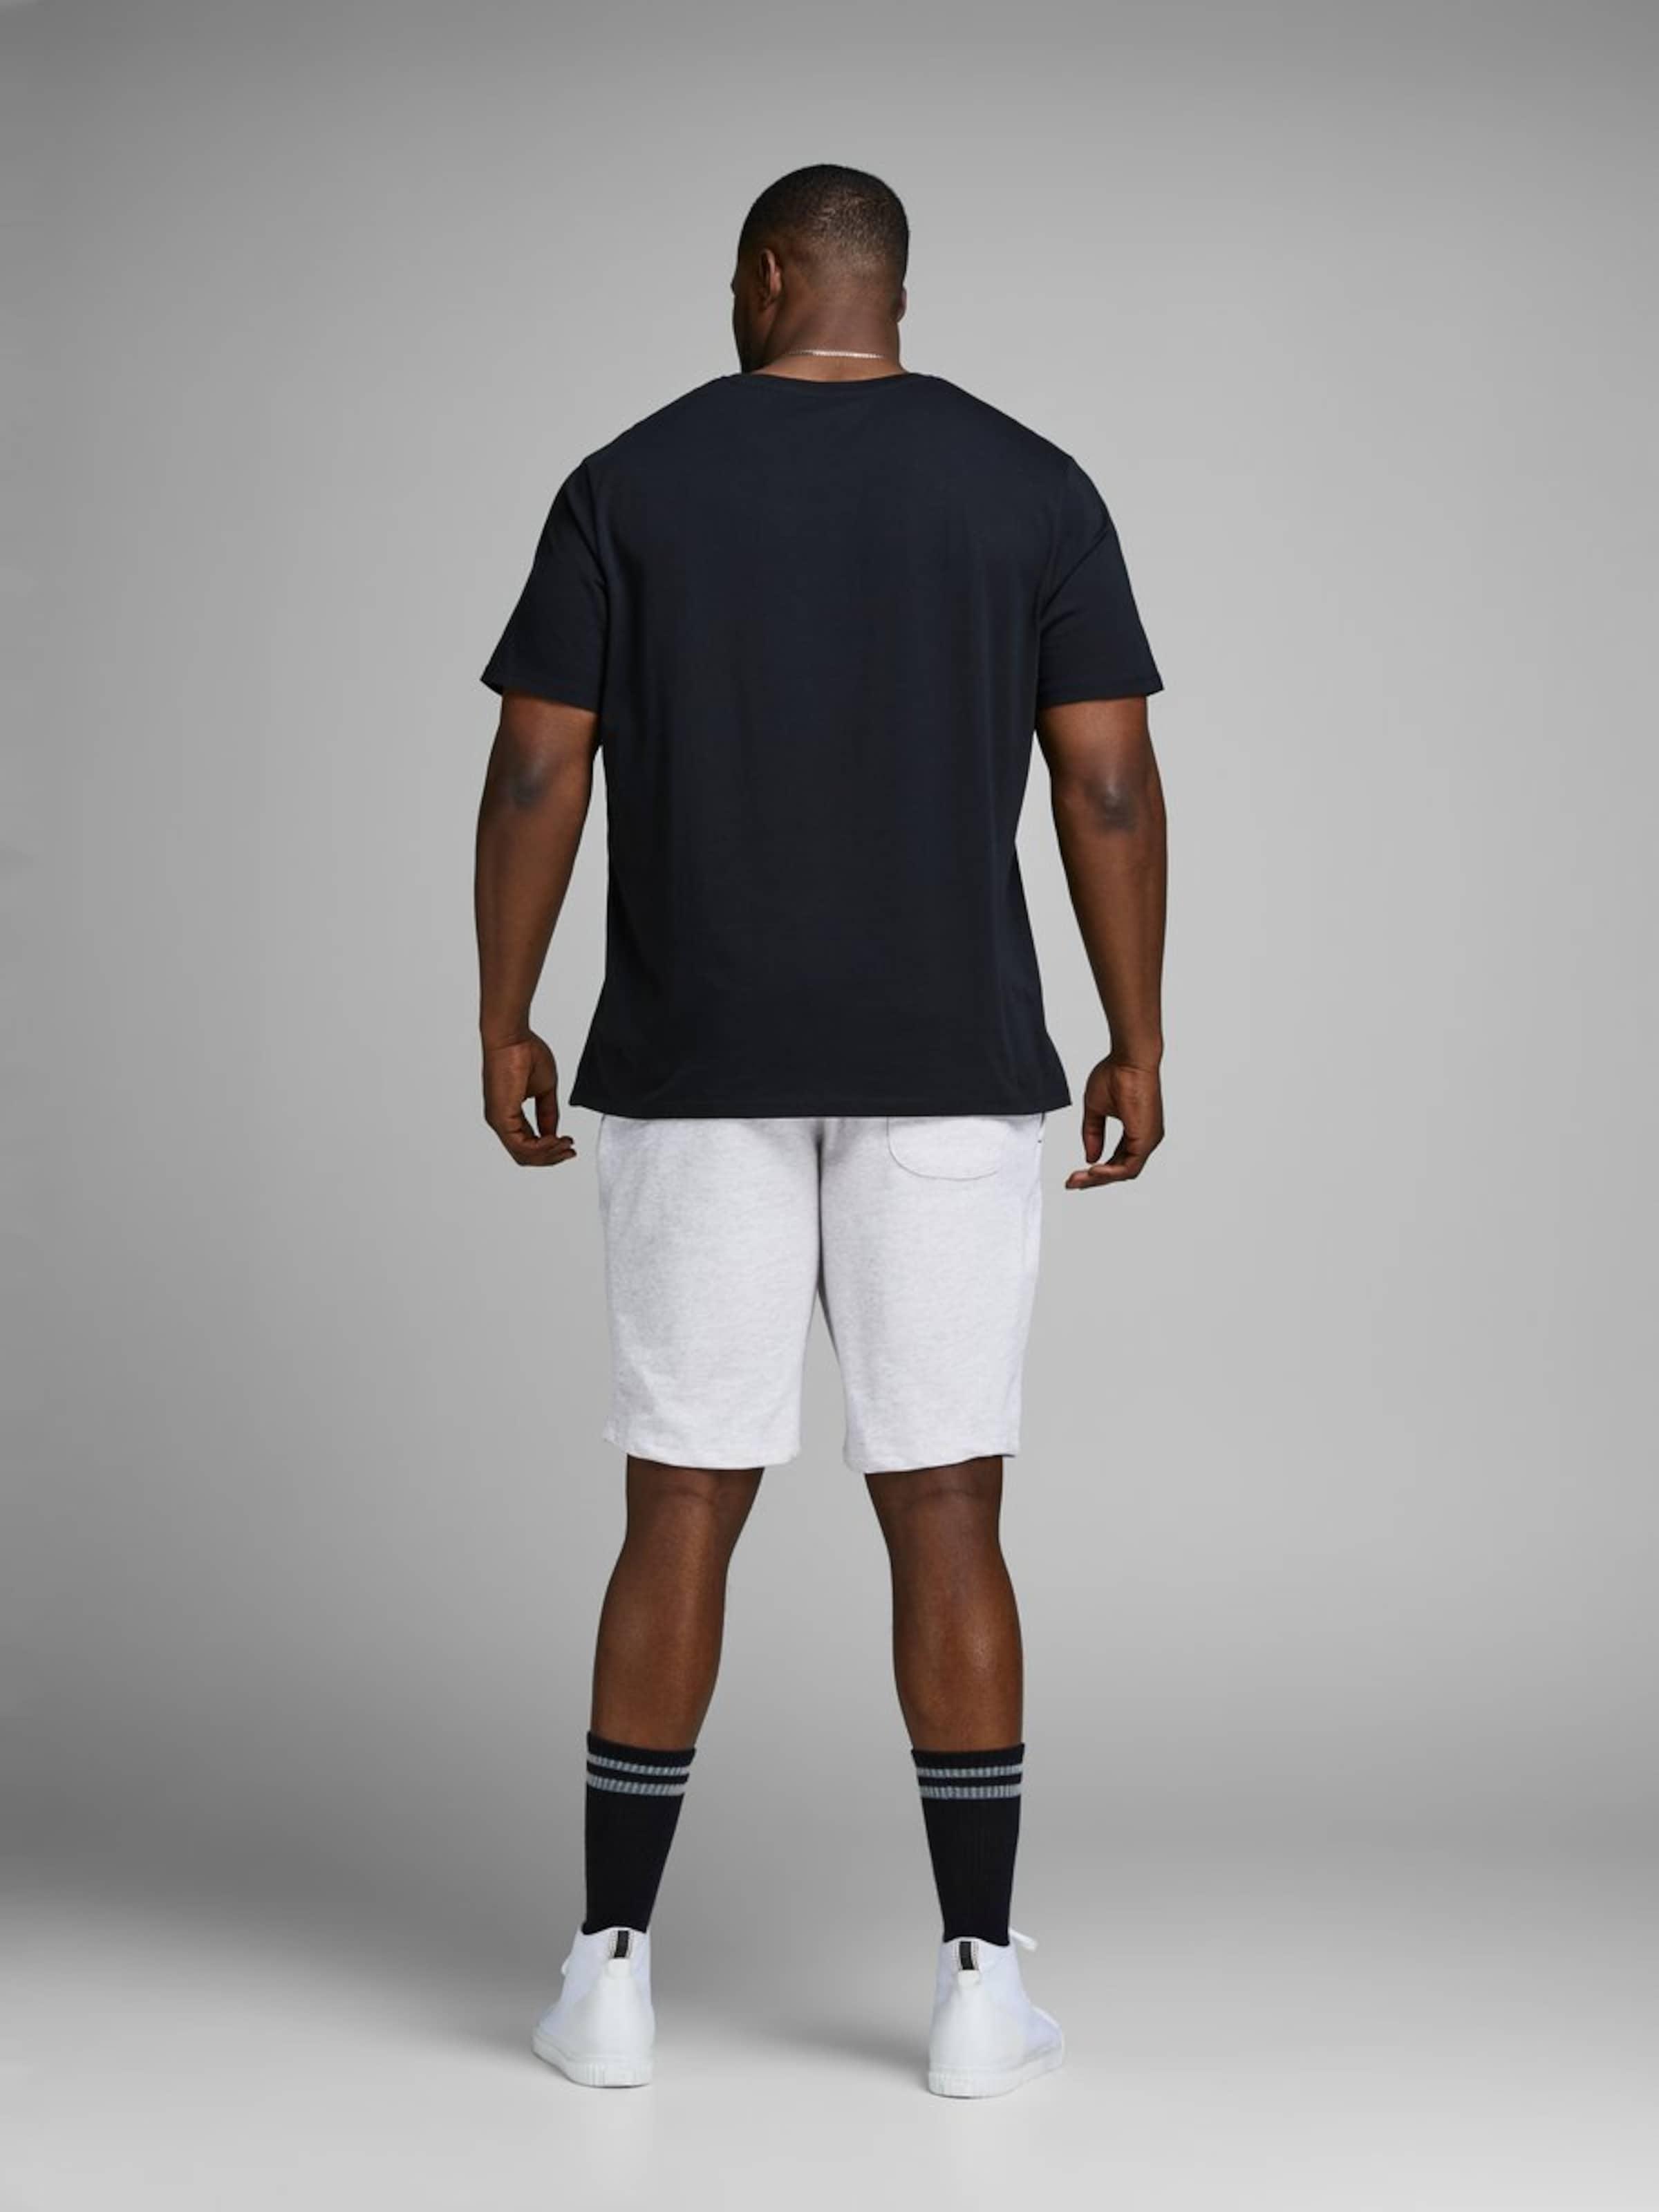 Jones Hellgrau Jackamp; Jones In Hellgrau Jones In Shorts Shorts Jackamp; Jackamp; H9eWID2EY